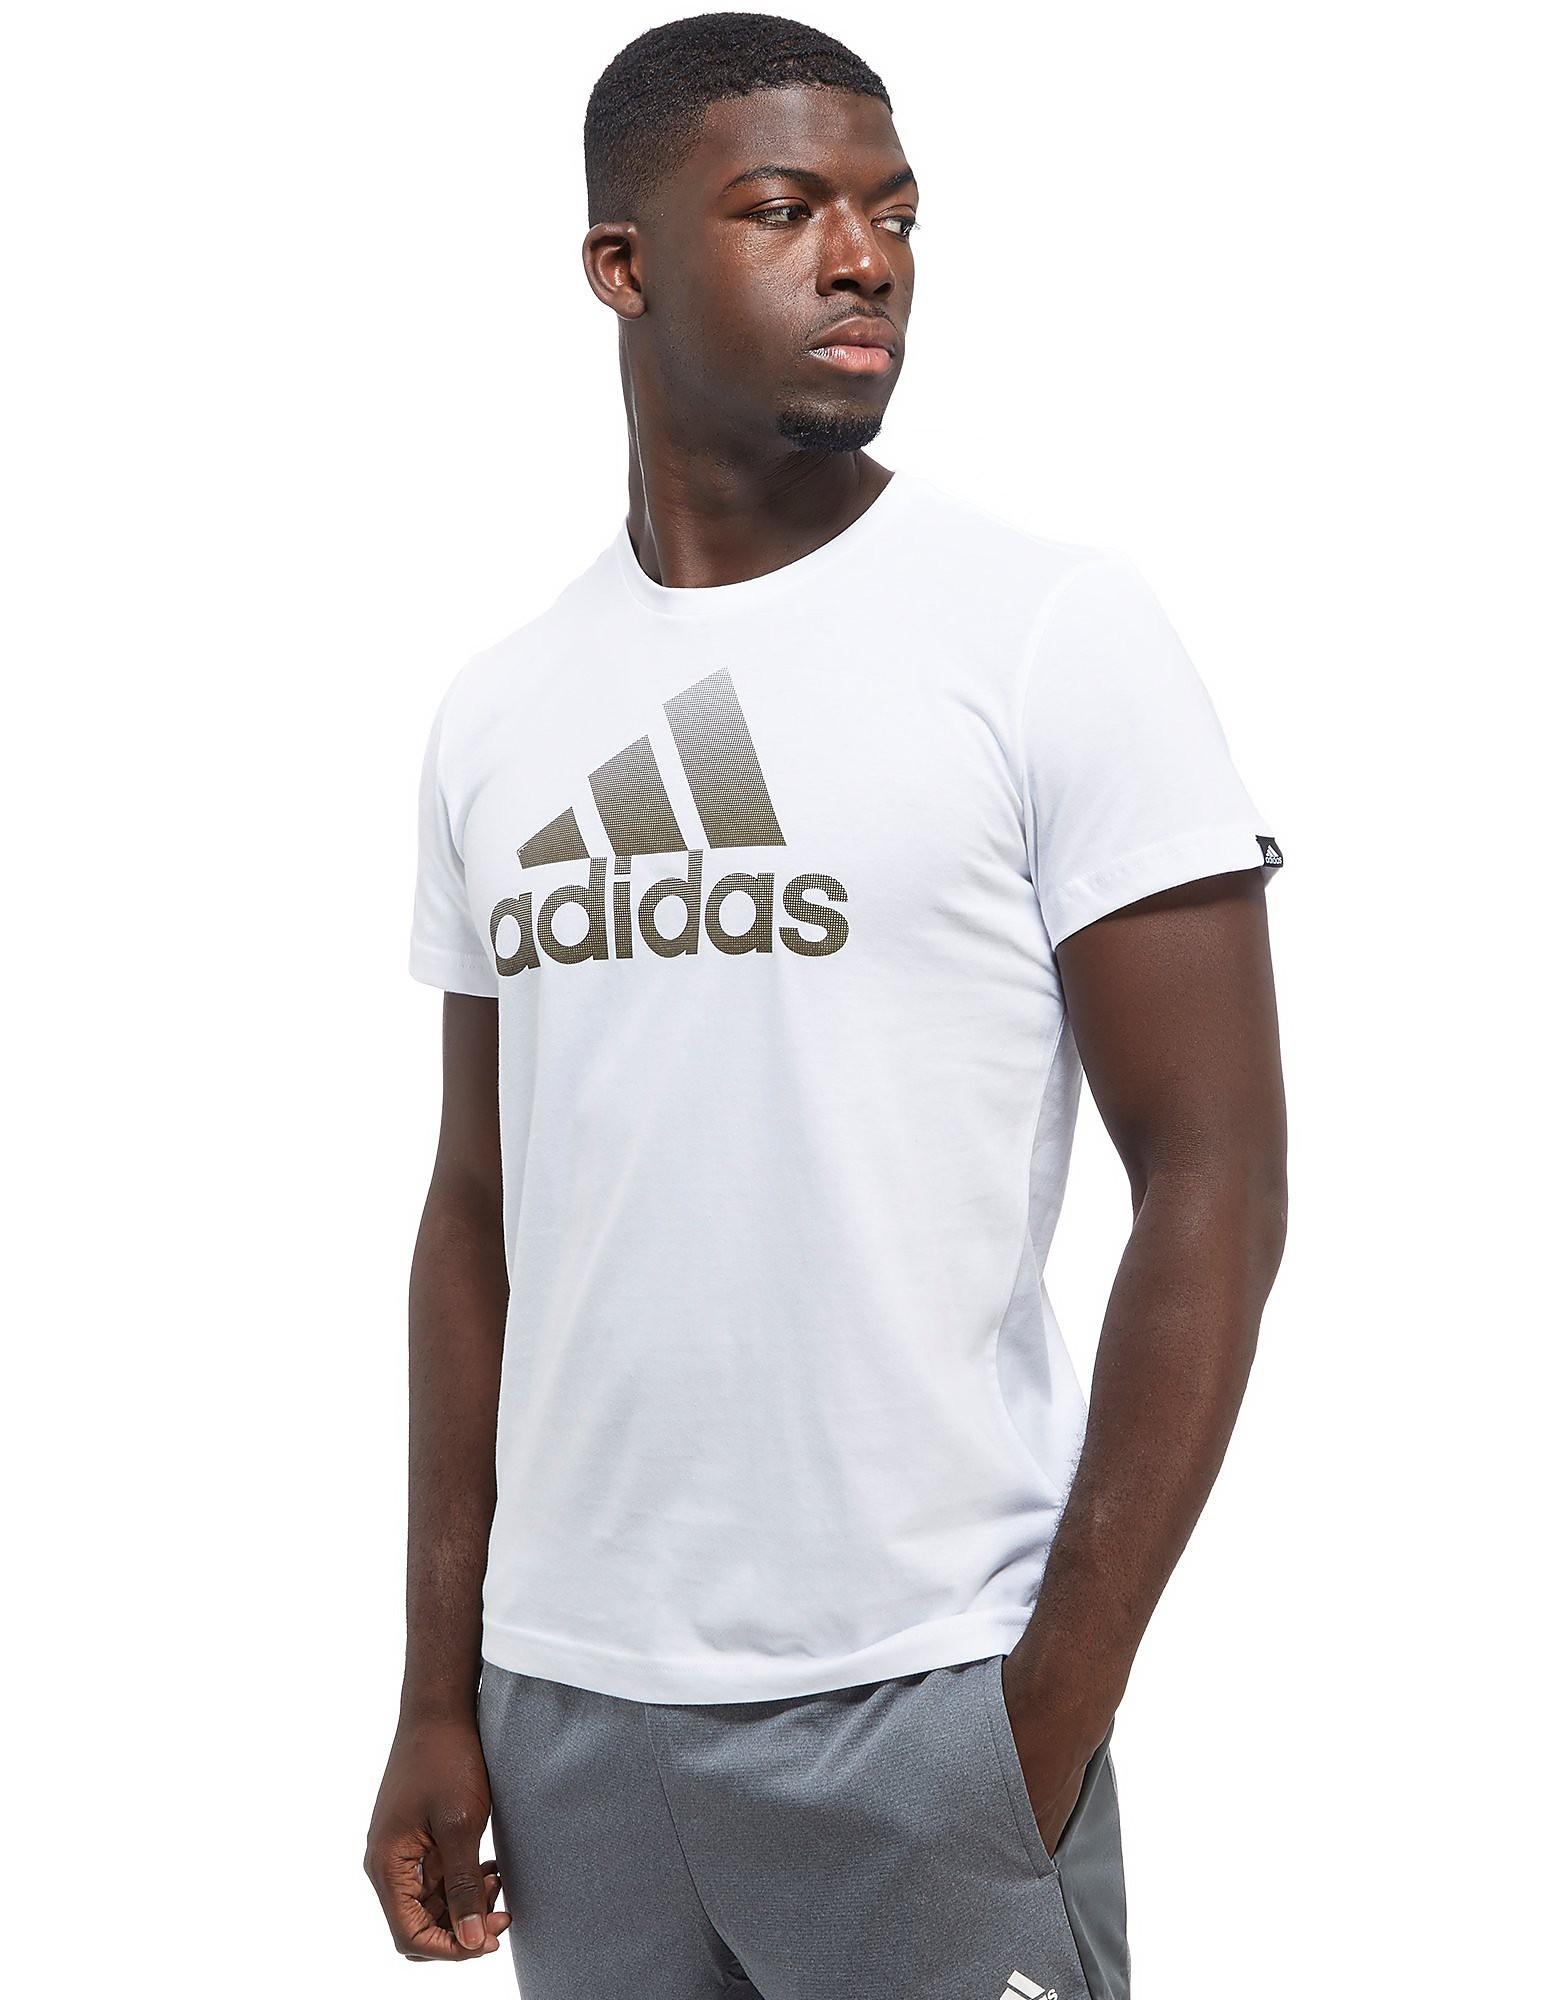 adidas camiseta Perforated Fade